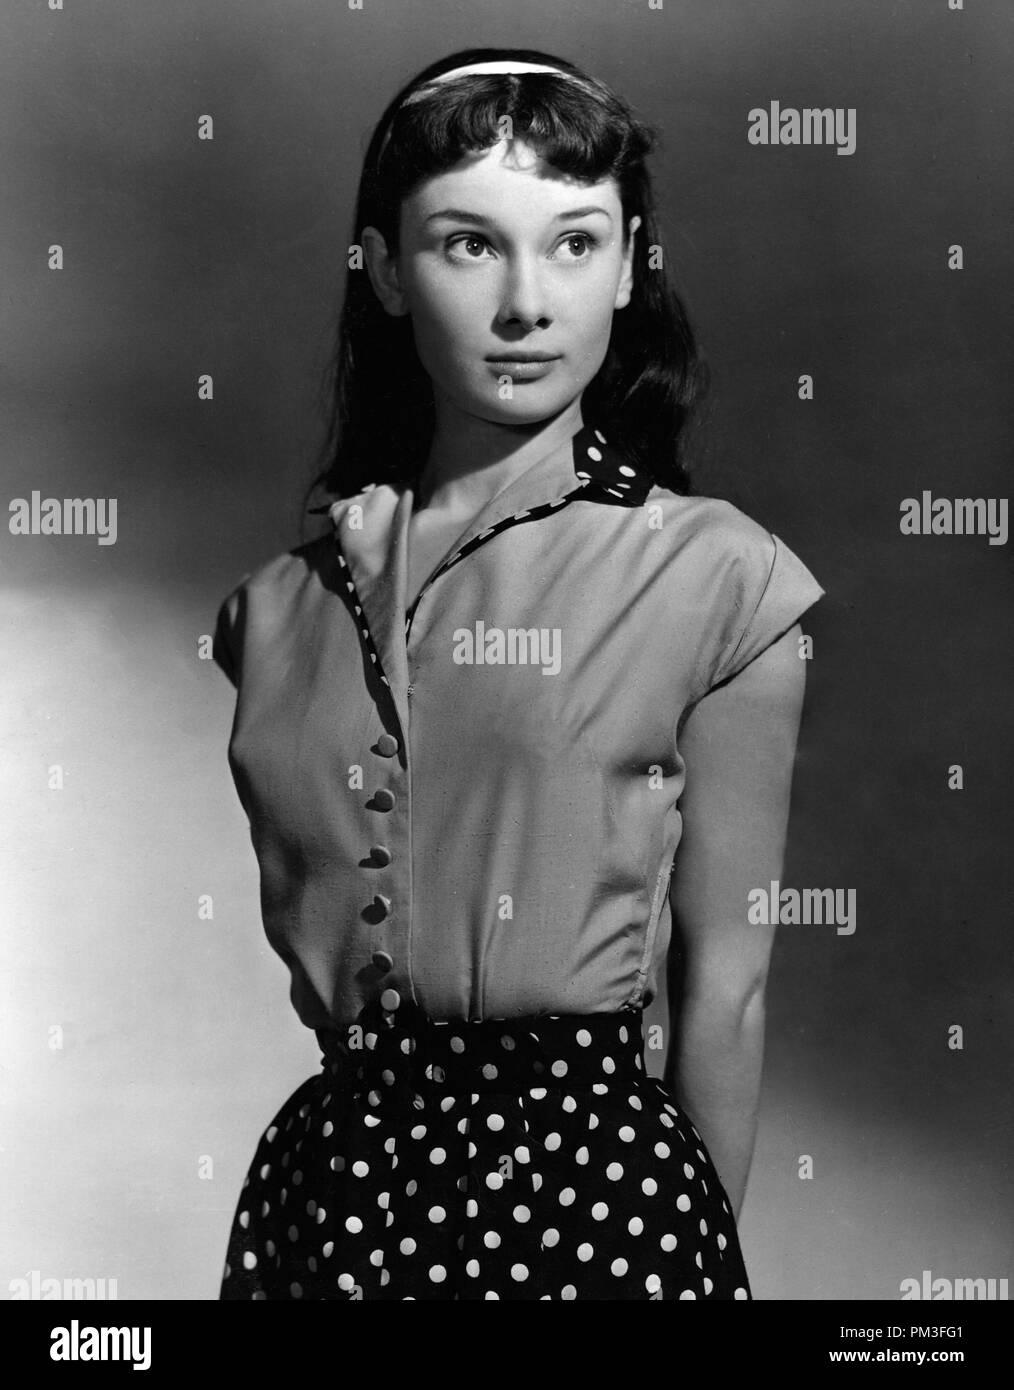 Studio Publicity Still: Audrey Hepburn in stage version of 'Gigi'    1952    File Reference # 30732_1138THA - Stock Image